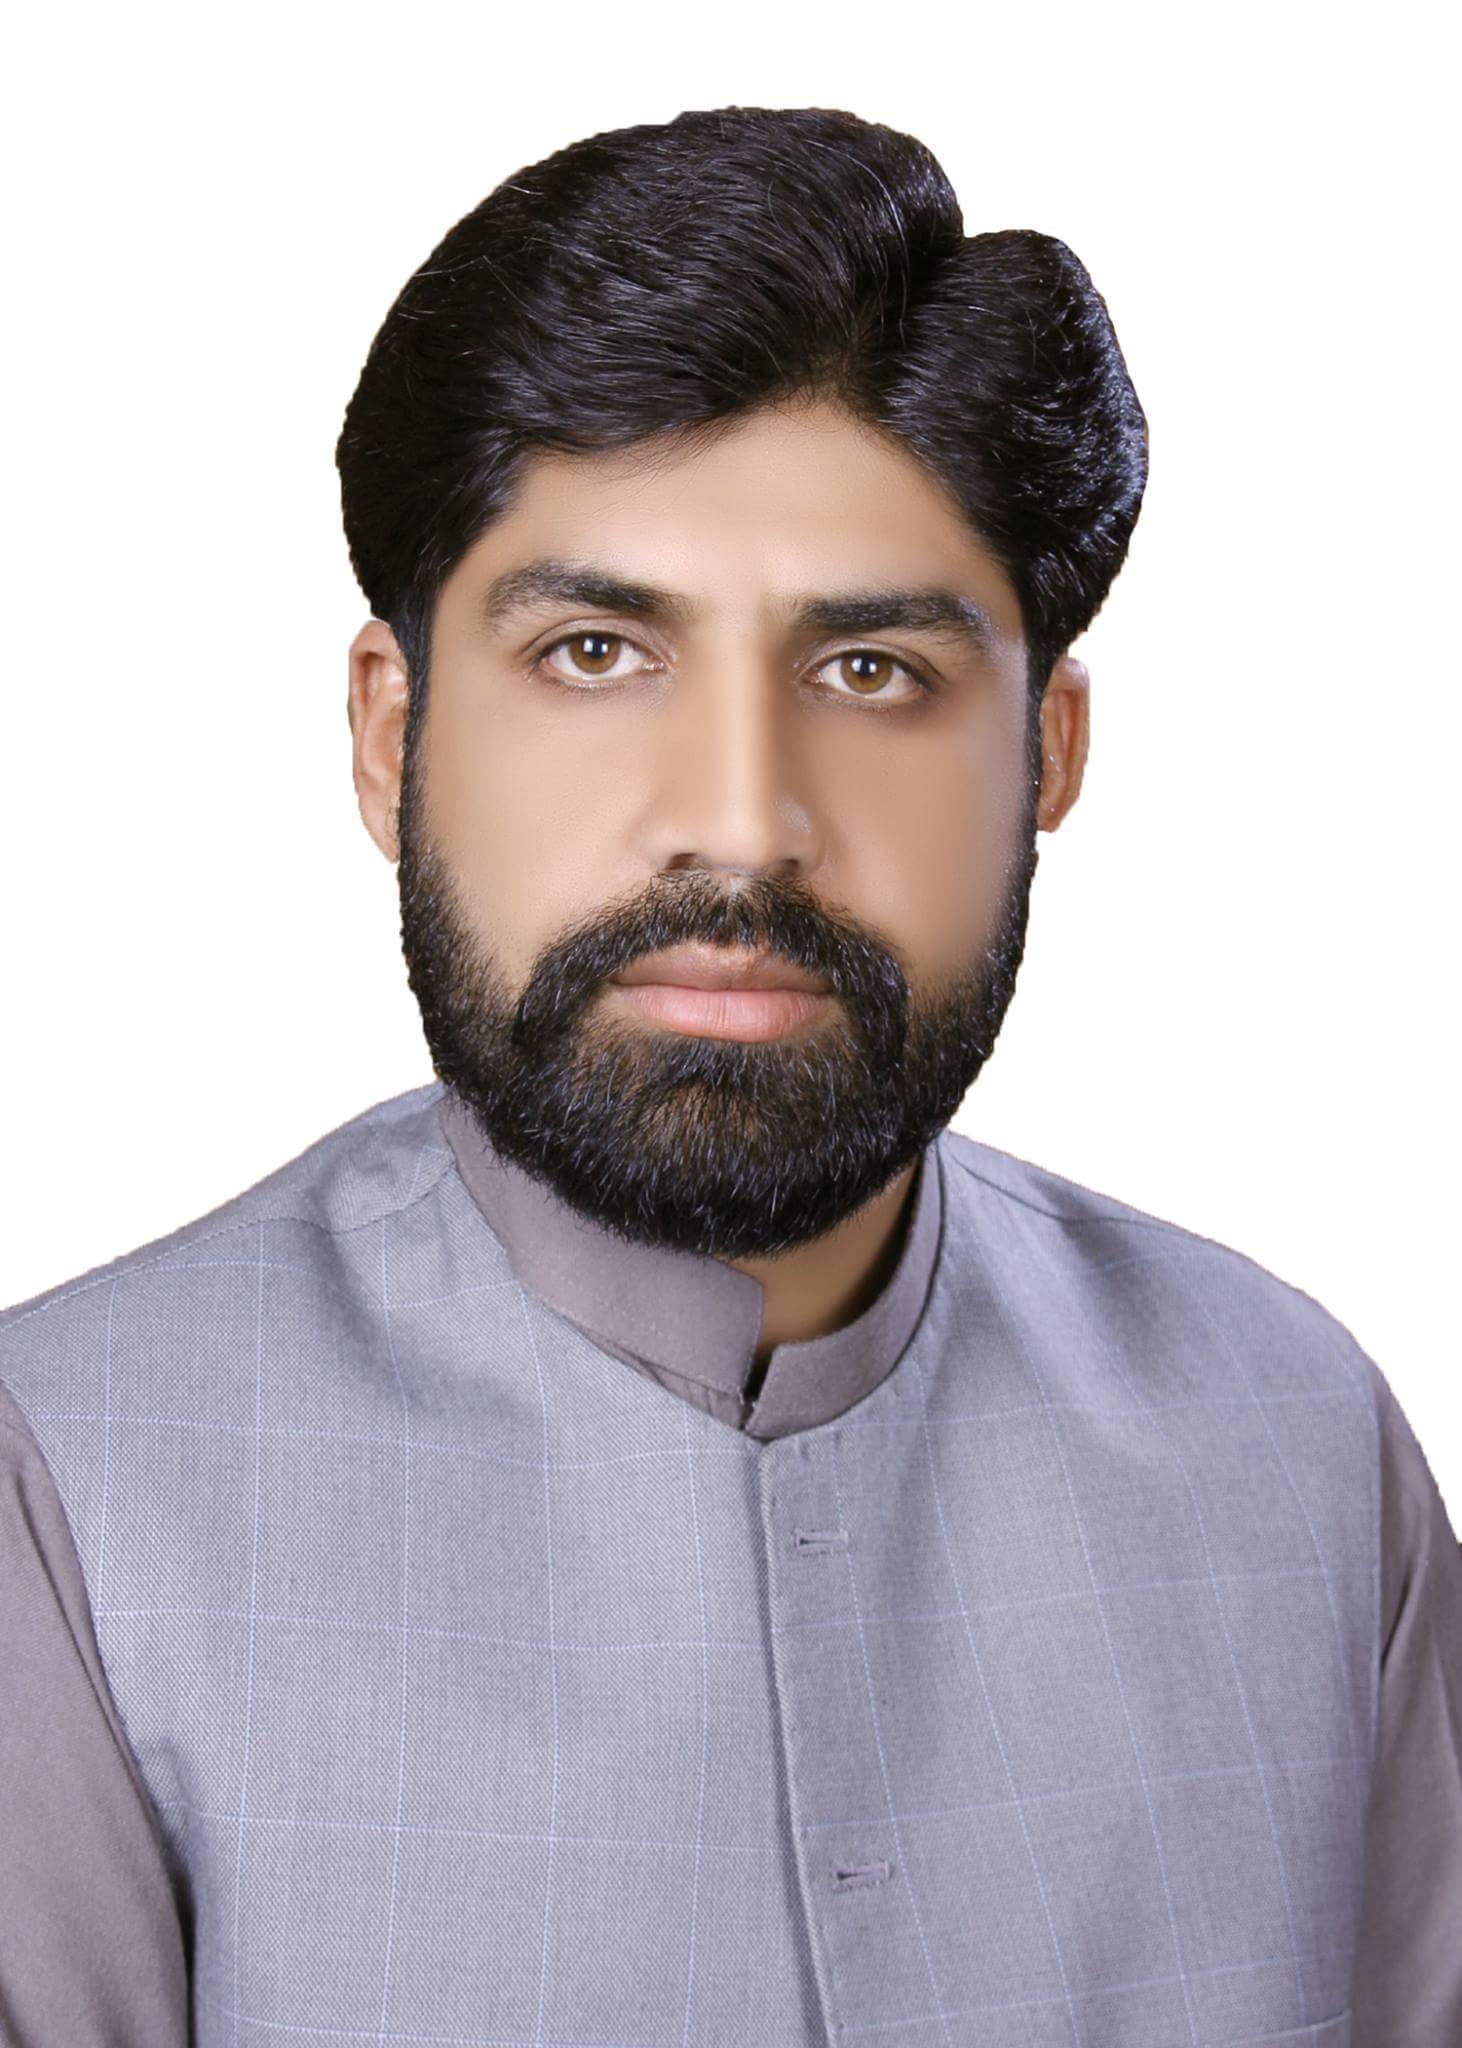 Asad Javed